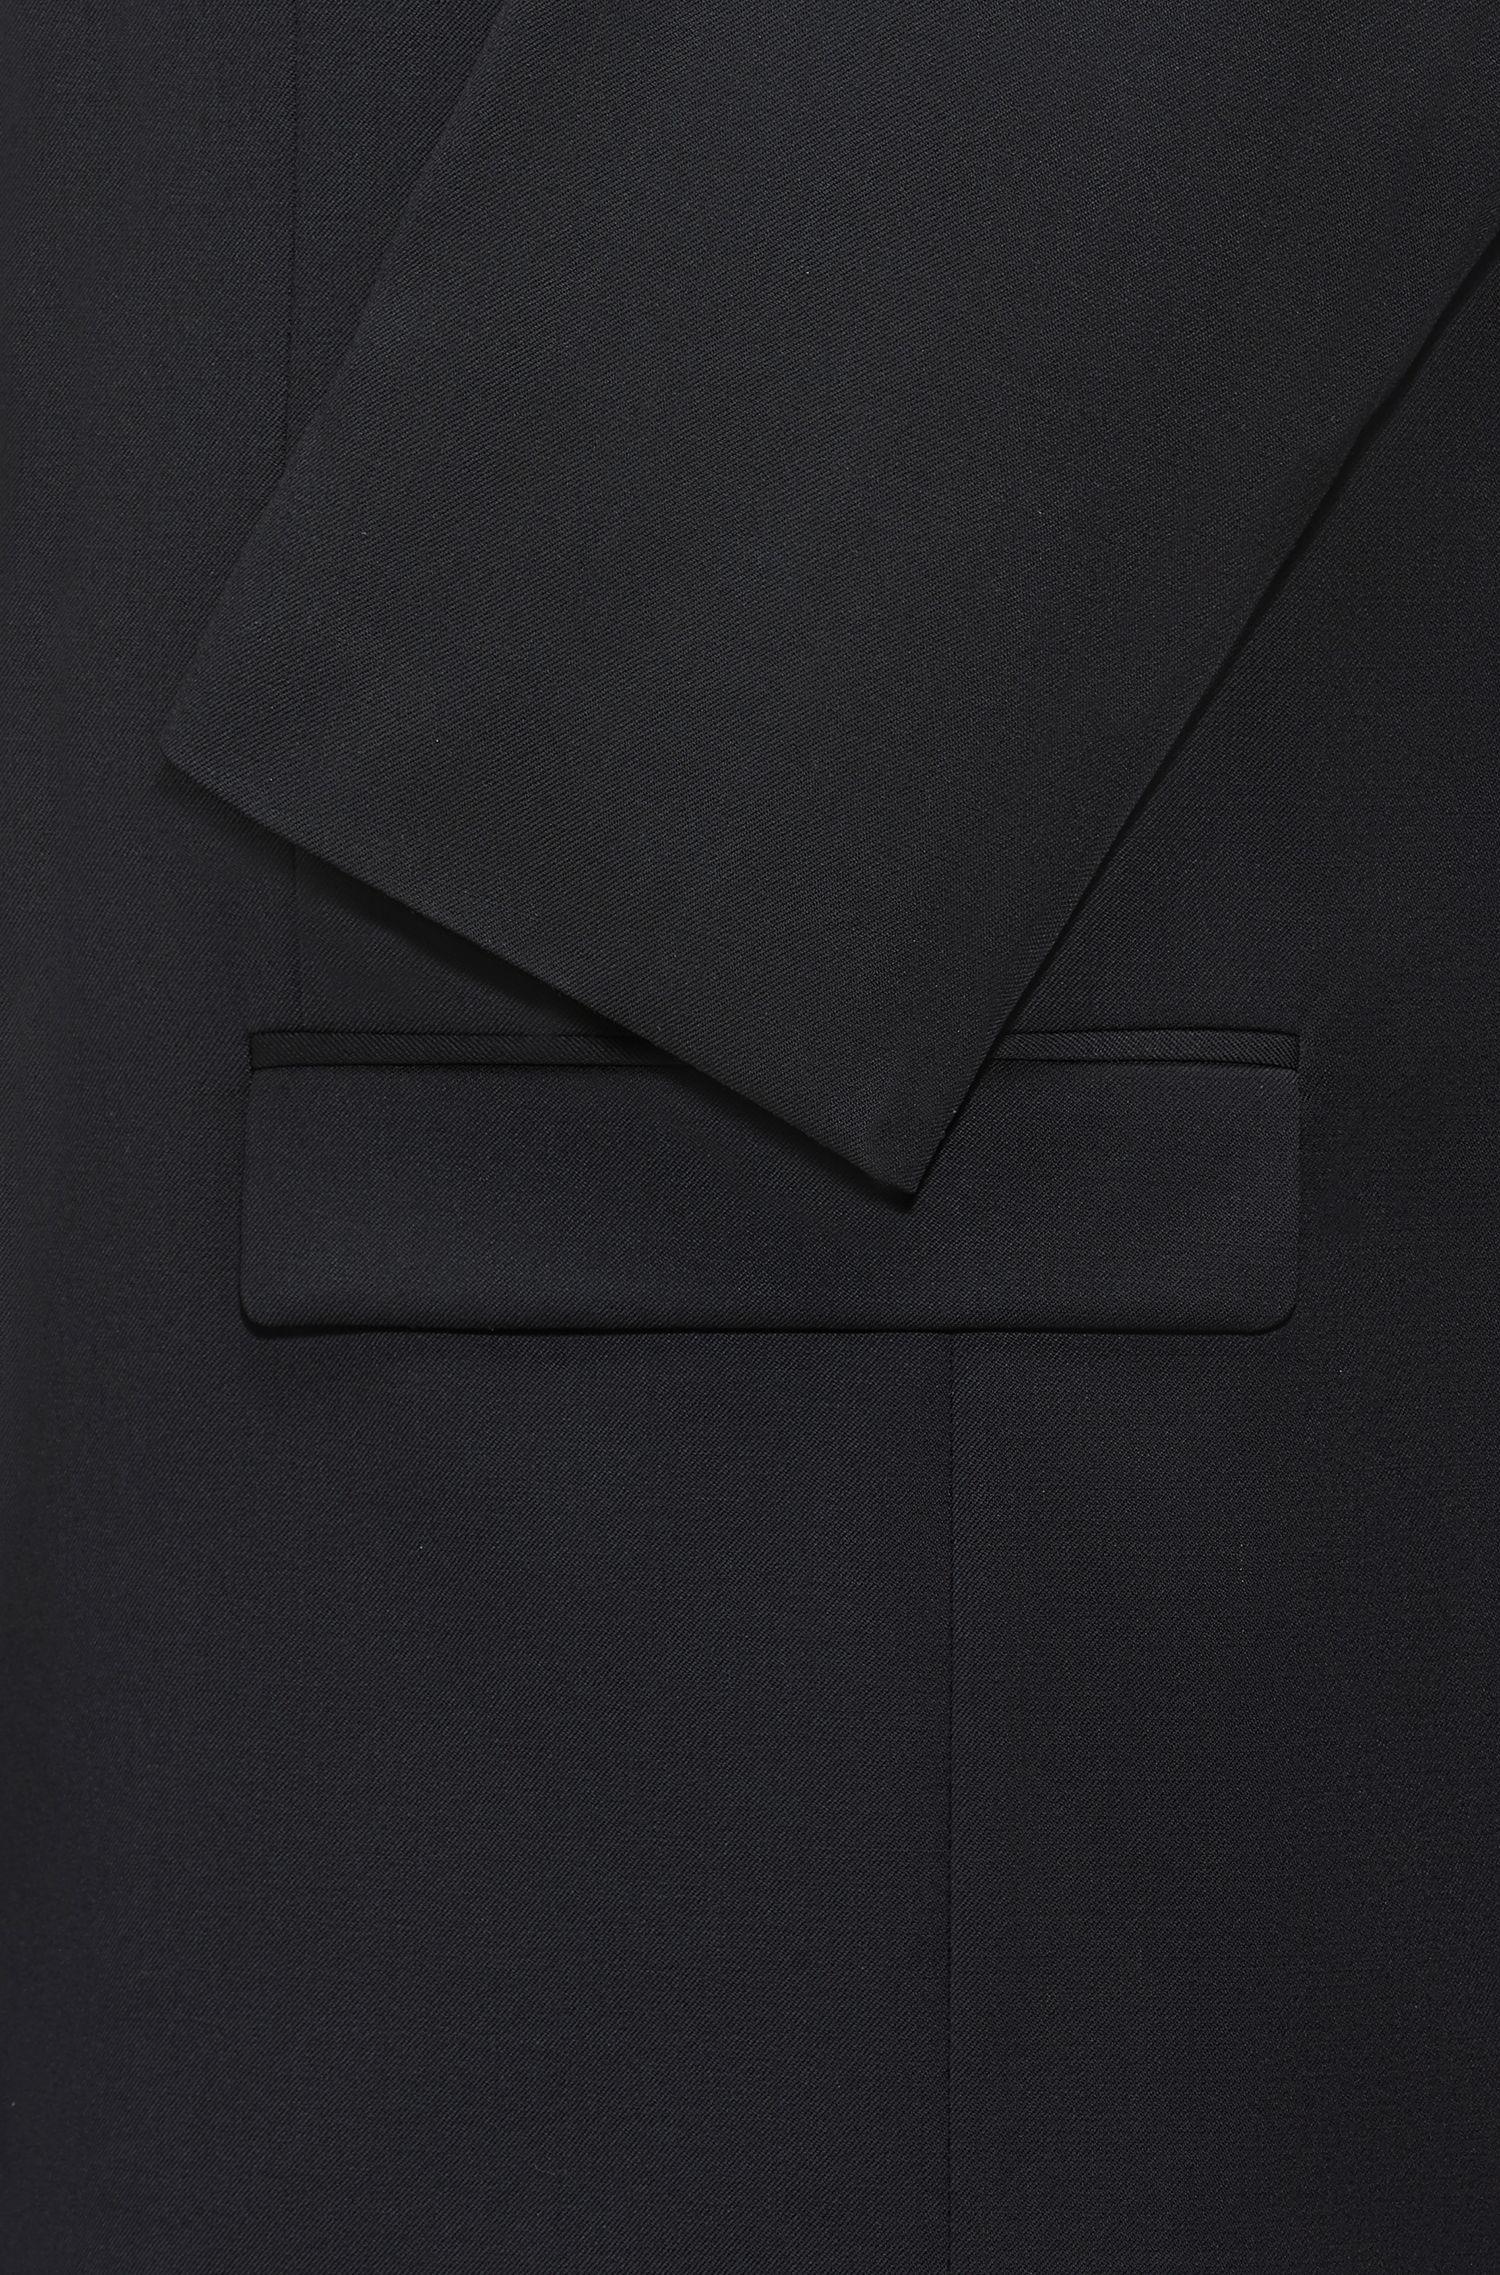 Giacca regular fit in lana vergine con chiusura a zip